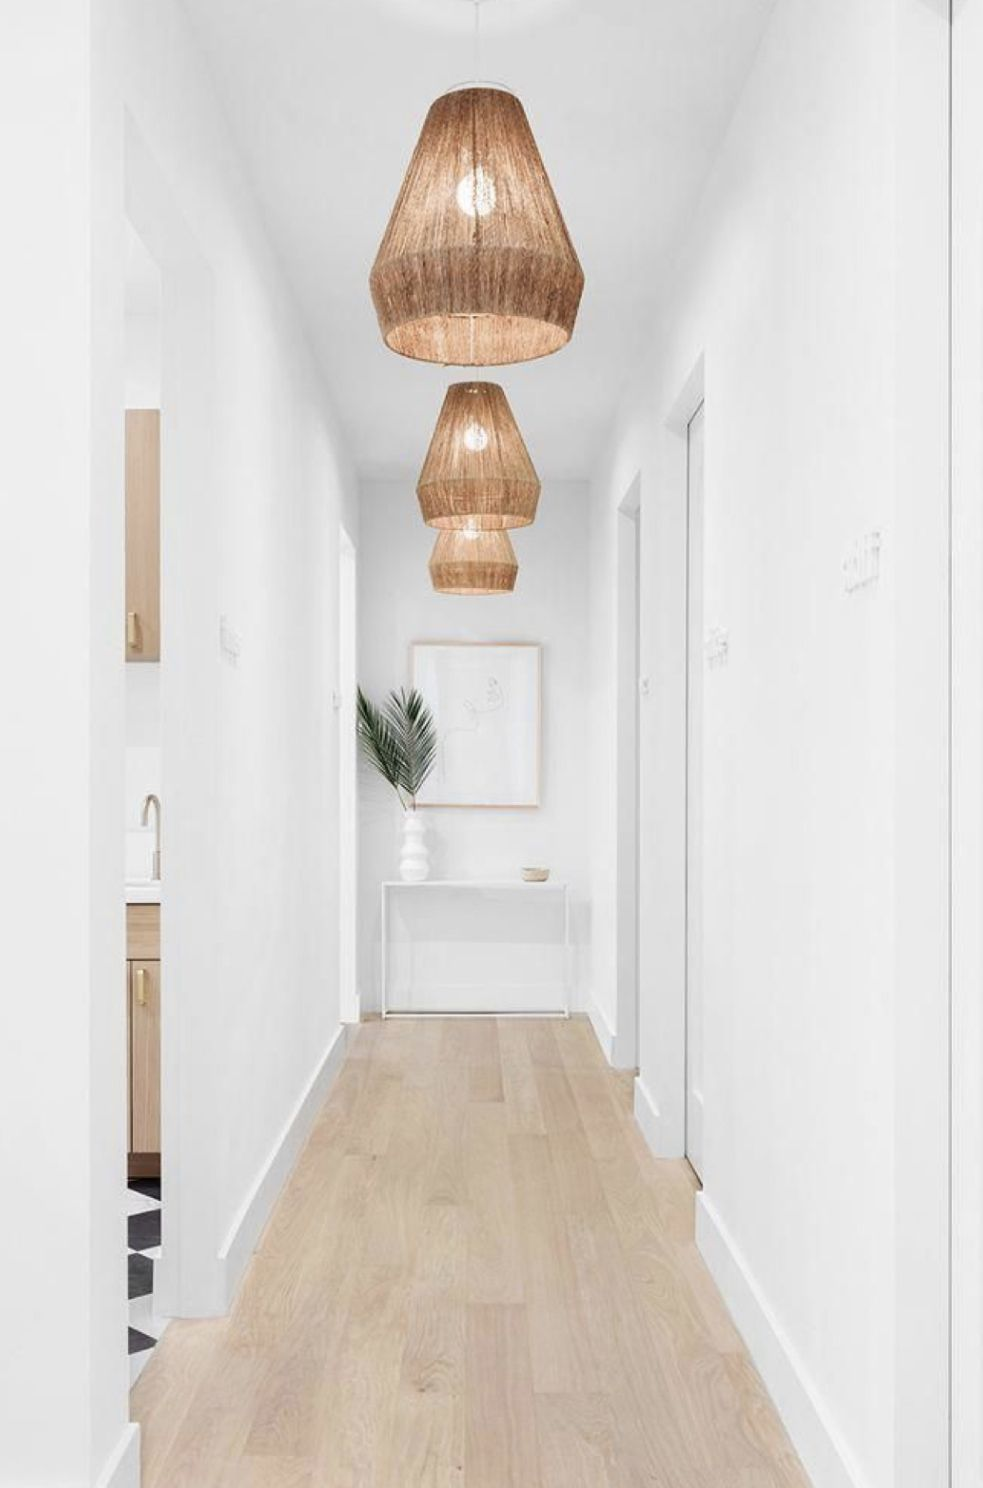 Pin By Susanne Kuster On Home Ideas Decor In 2020 Entryway Decor Modern Hallway Hallway Decorating